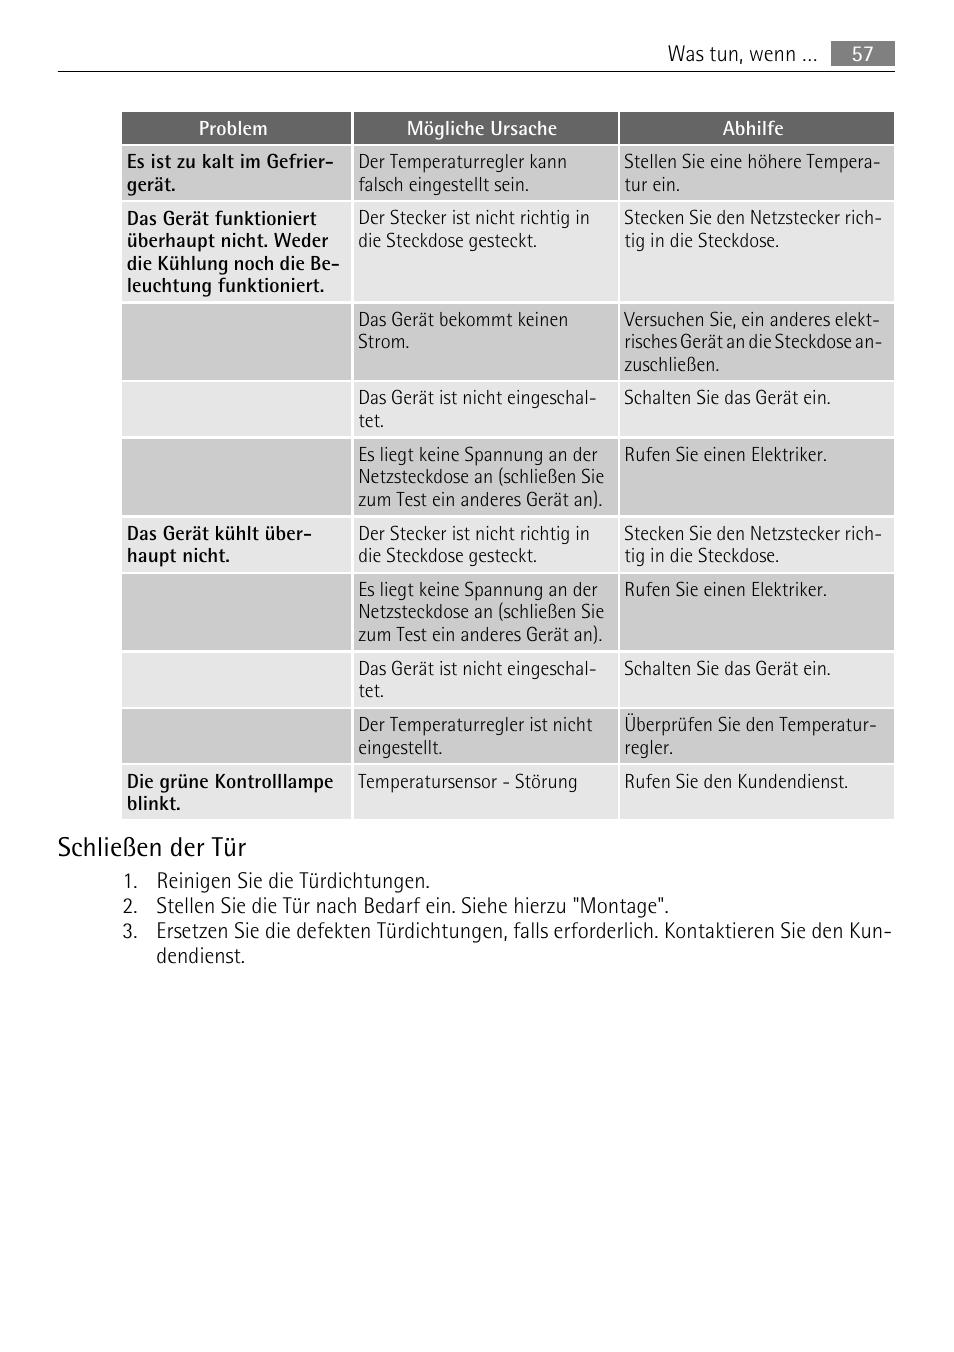 Beste Stecker Des Elektrikers Bilder - Verdrahtungsideen - korsmi.info